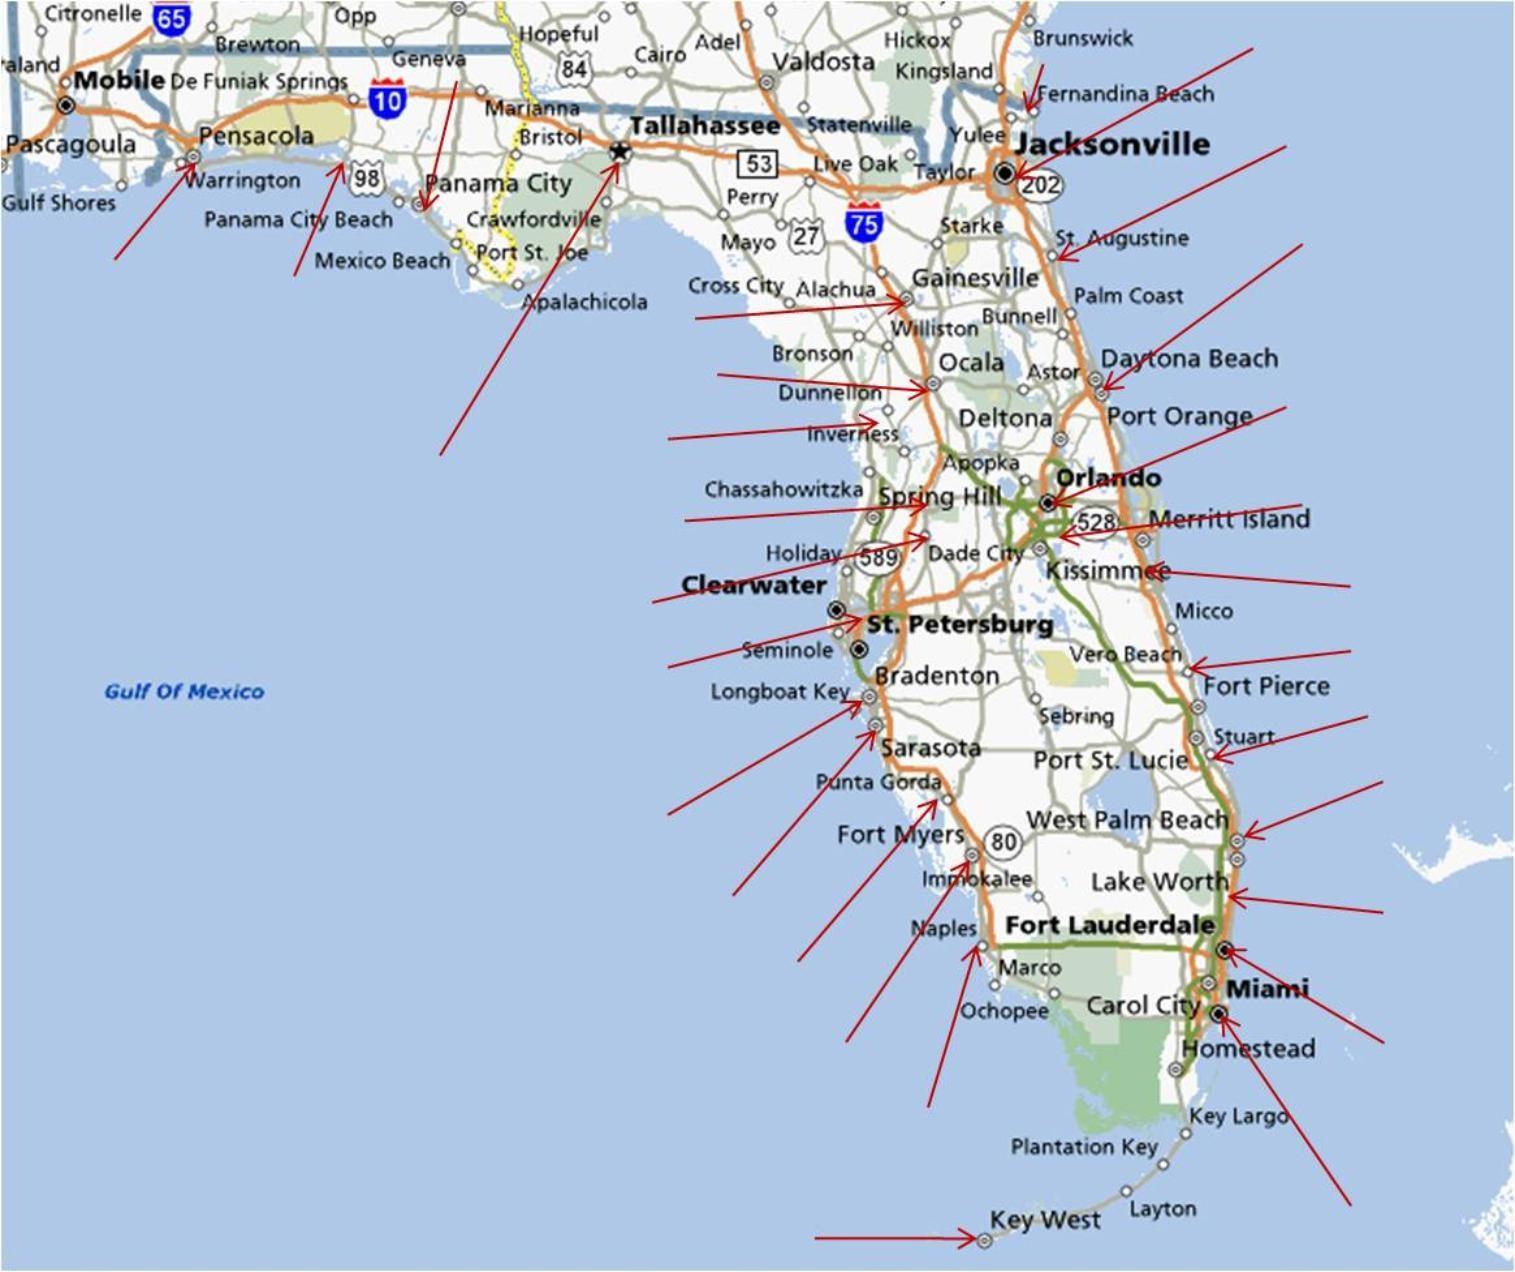 Mexico Beach Florida Map From Windsurfaddicts 9 - Judecelestin2010 - Panama Beach Florida Map